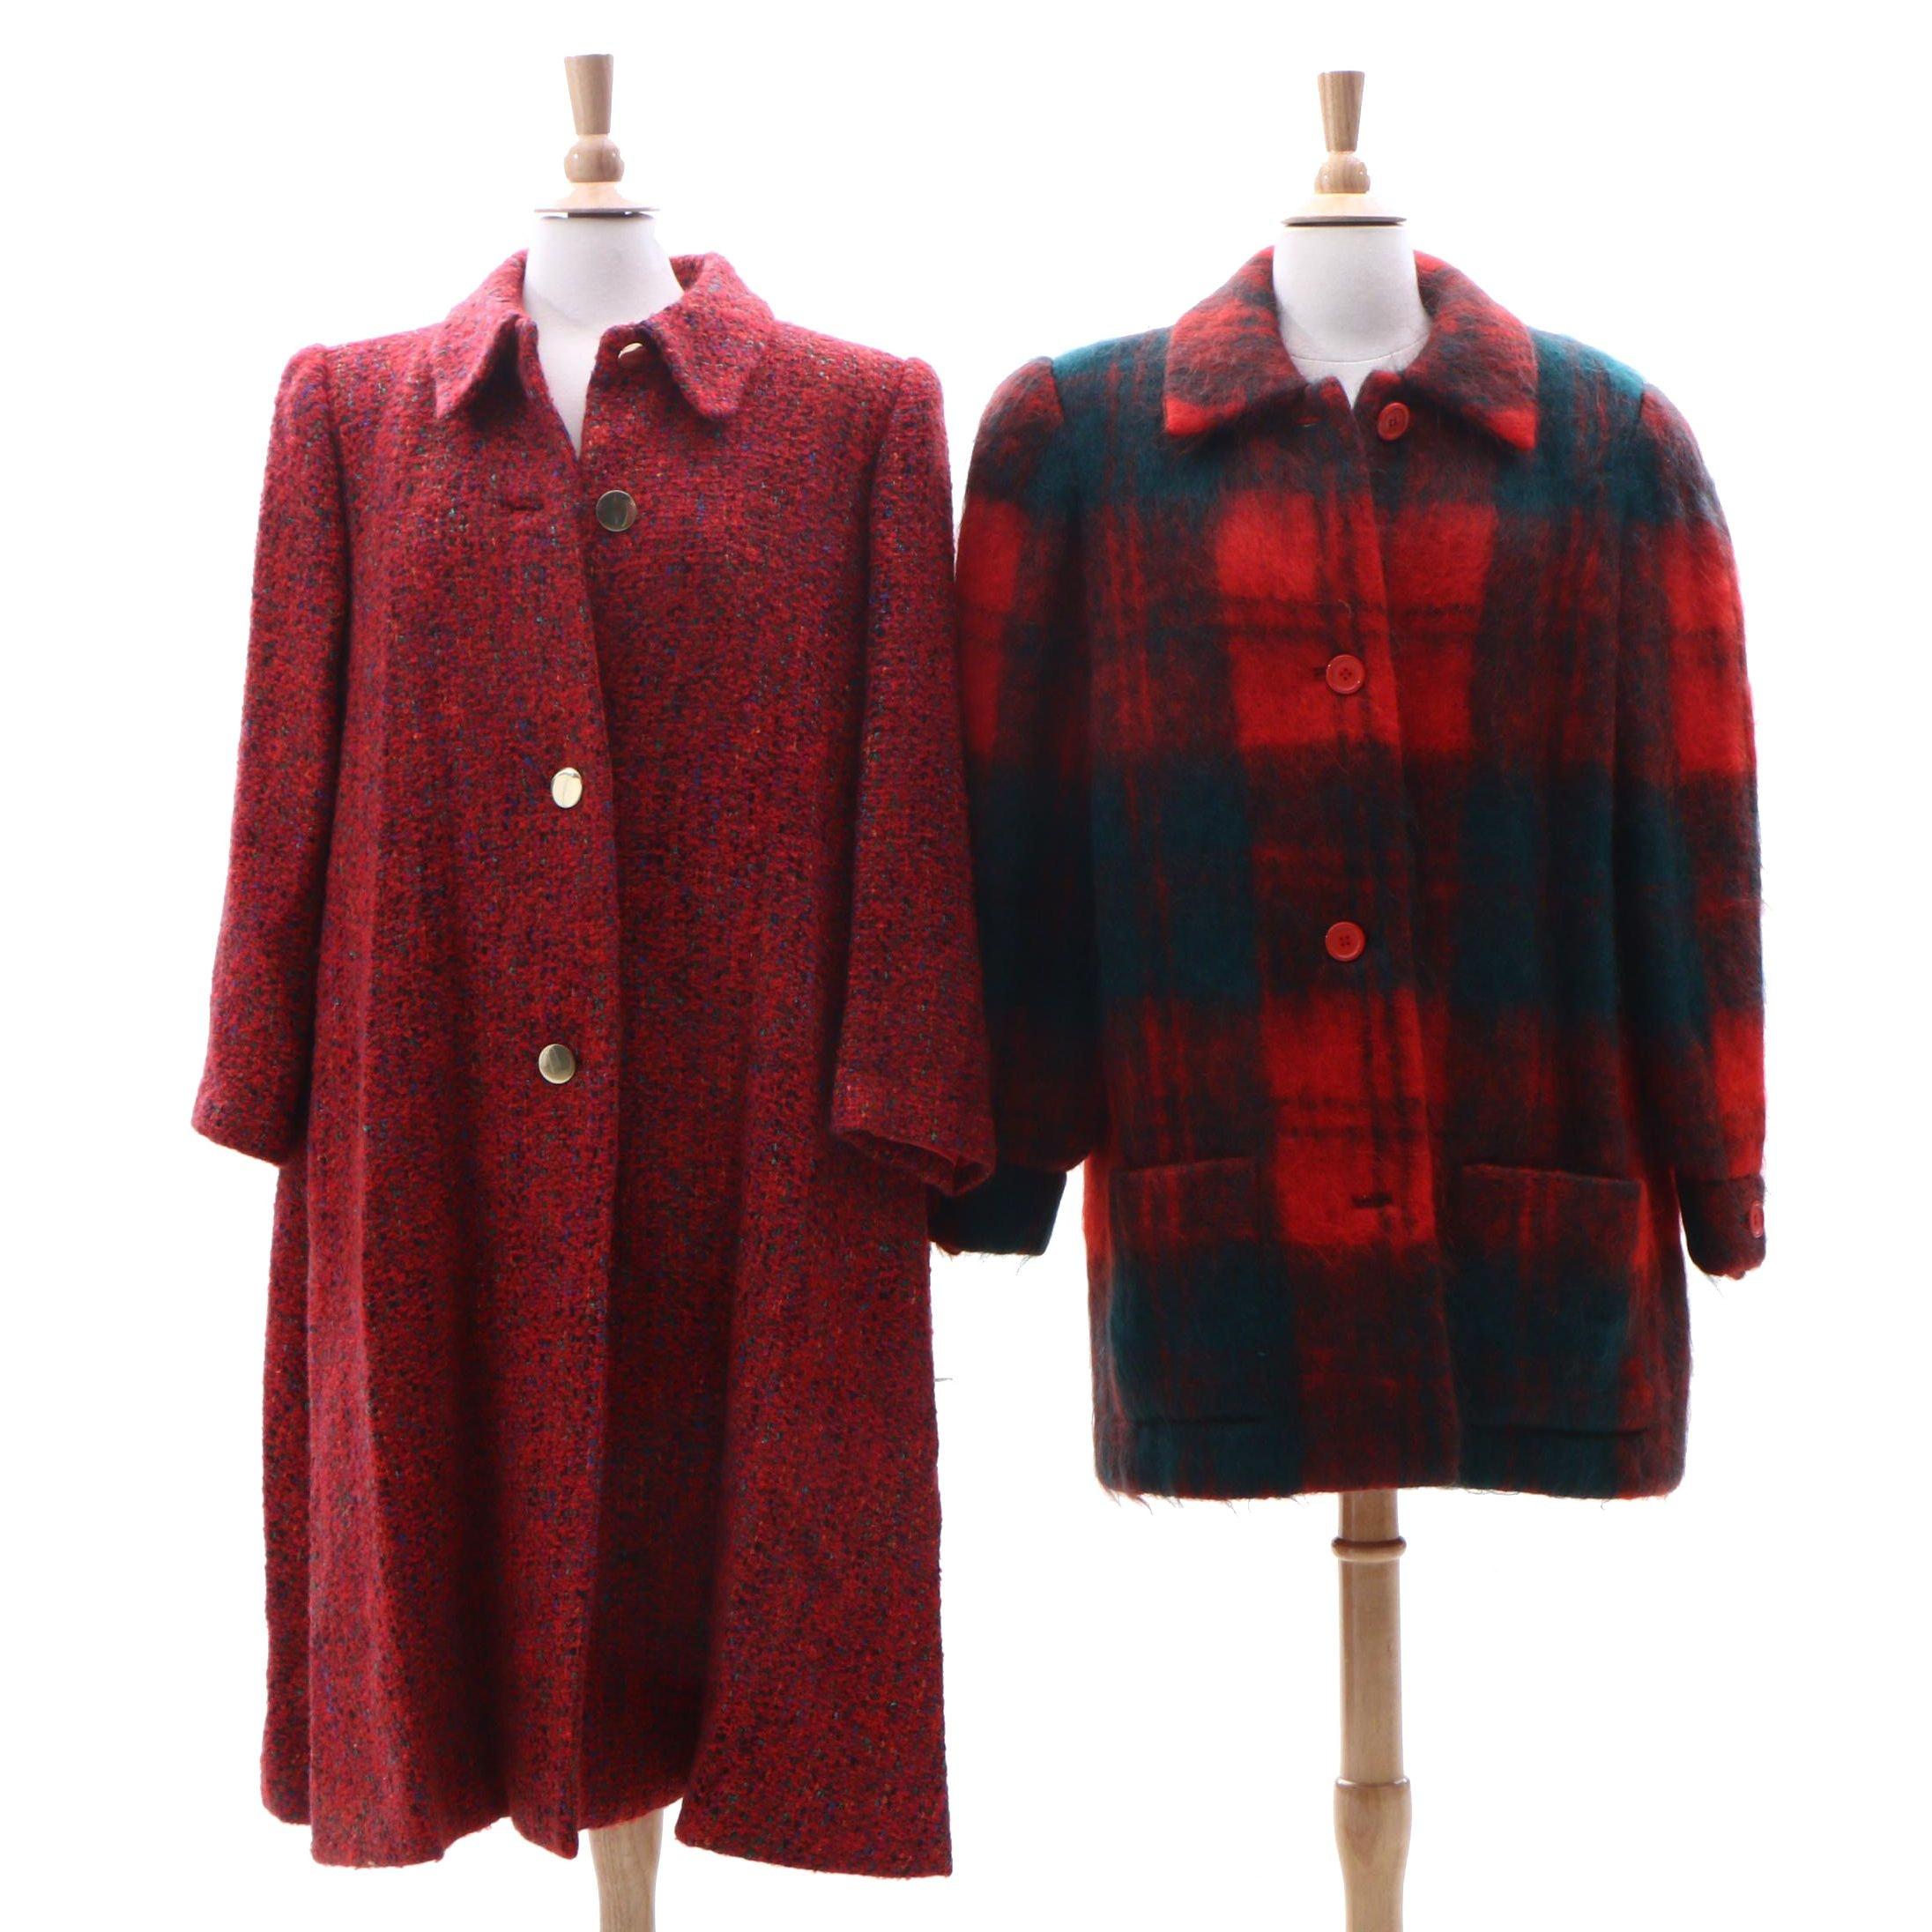 Helga Bouclé Wool Blend Coat and Mohair Plaid Coat, Vintage